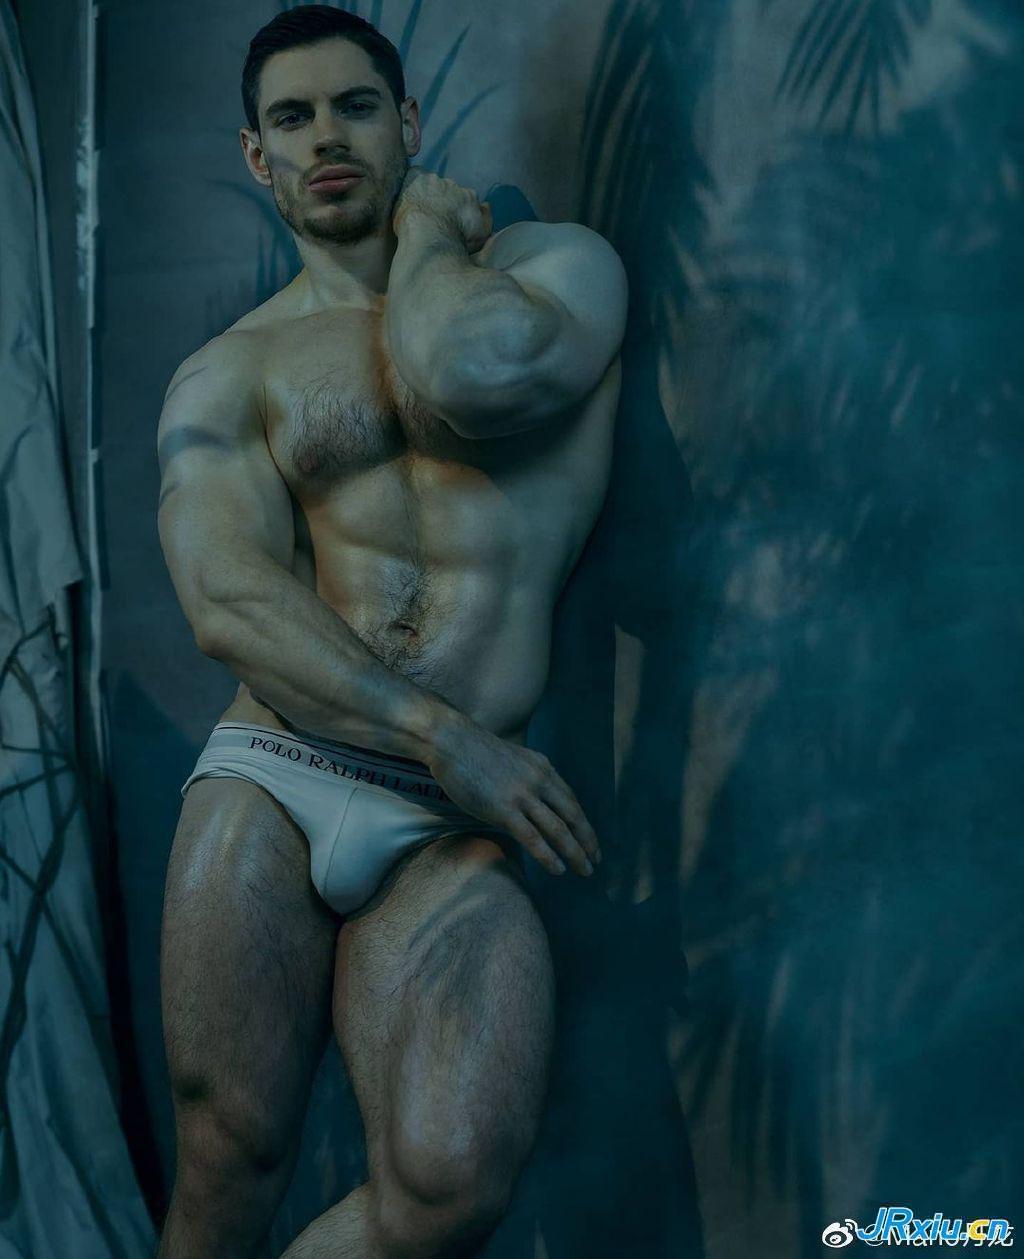 威猛英俊的法国肌肉男模Antoine Morieult